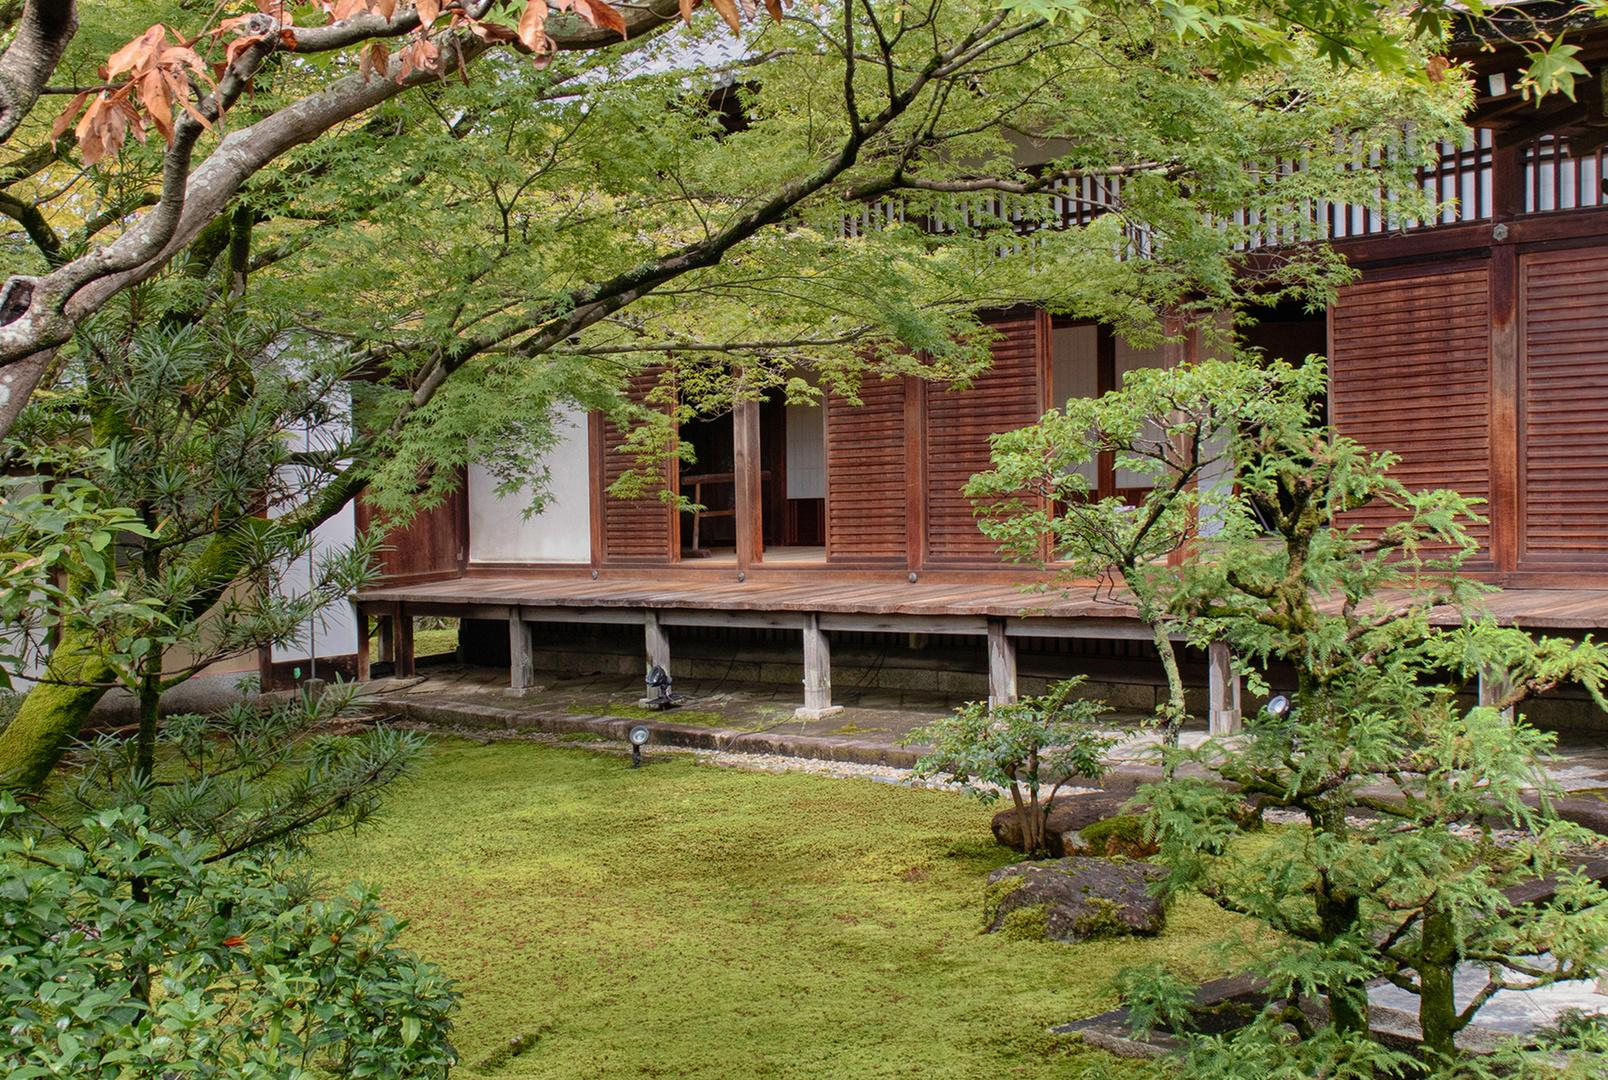 At Ninnaji Temple in Kyoto 6